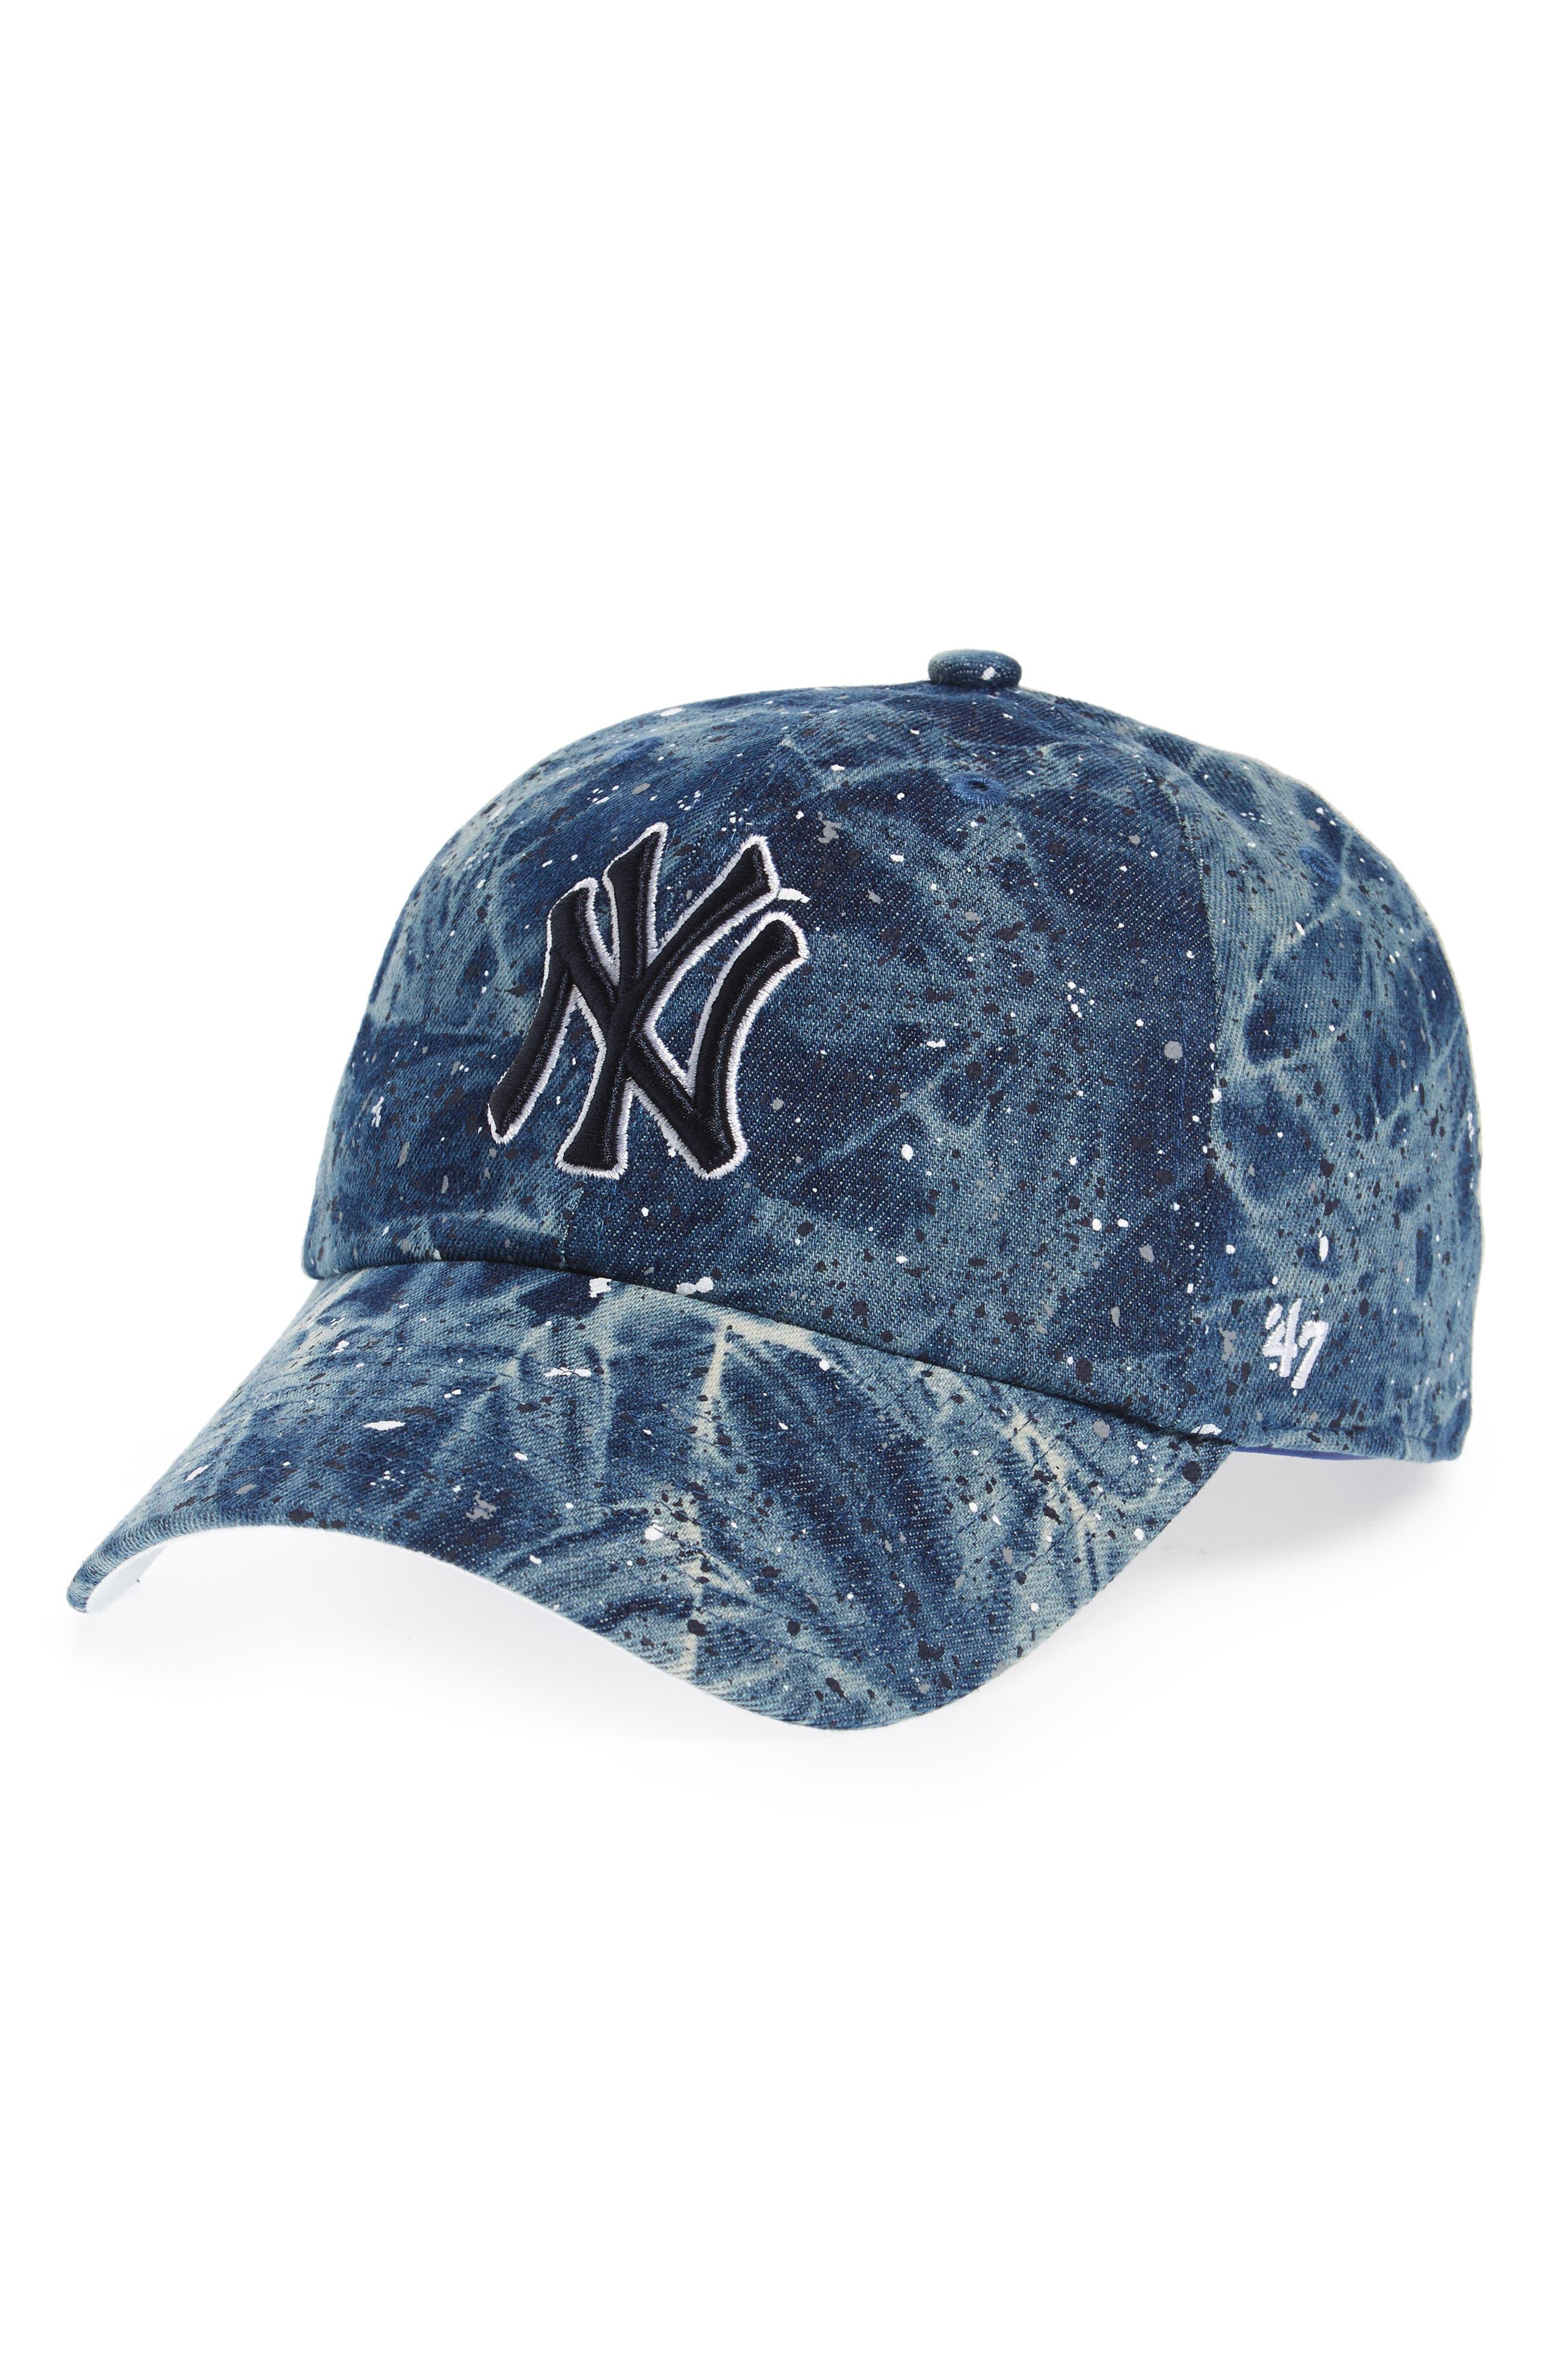 New York Yankees - Blue Splatter Baseball Cap,                             Main thumbnail 1, color,                             Blue